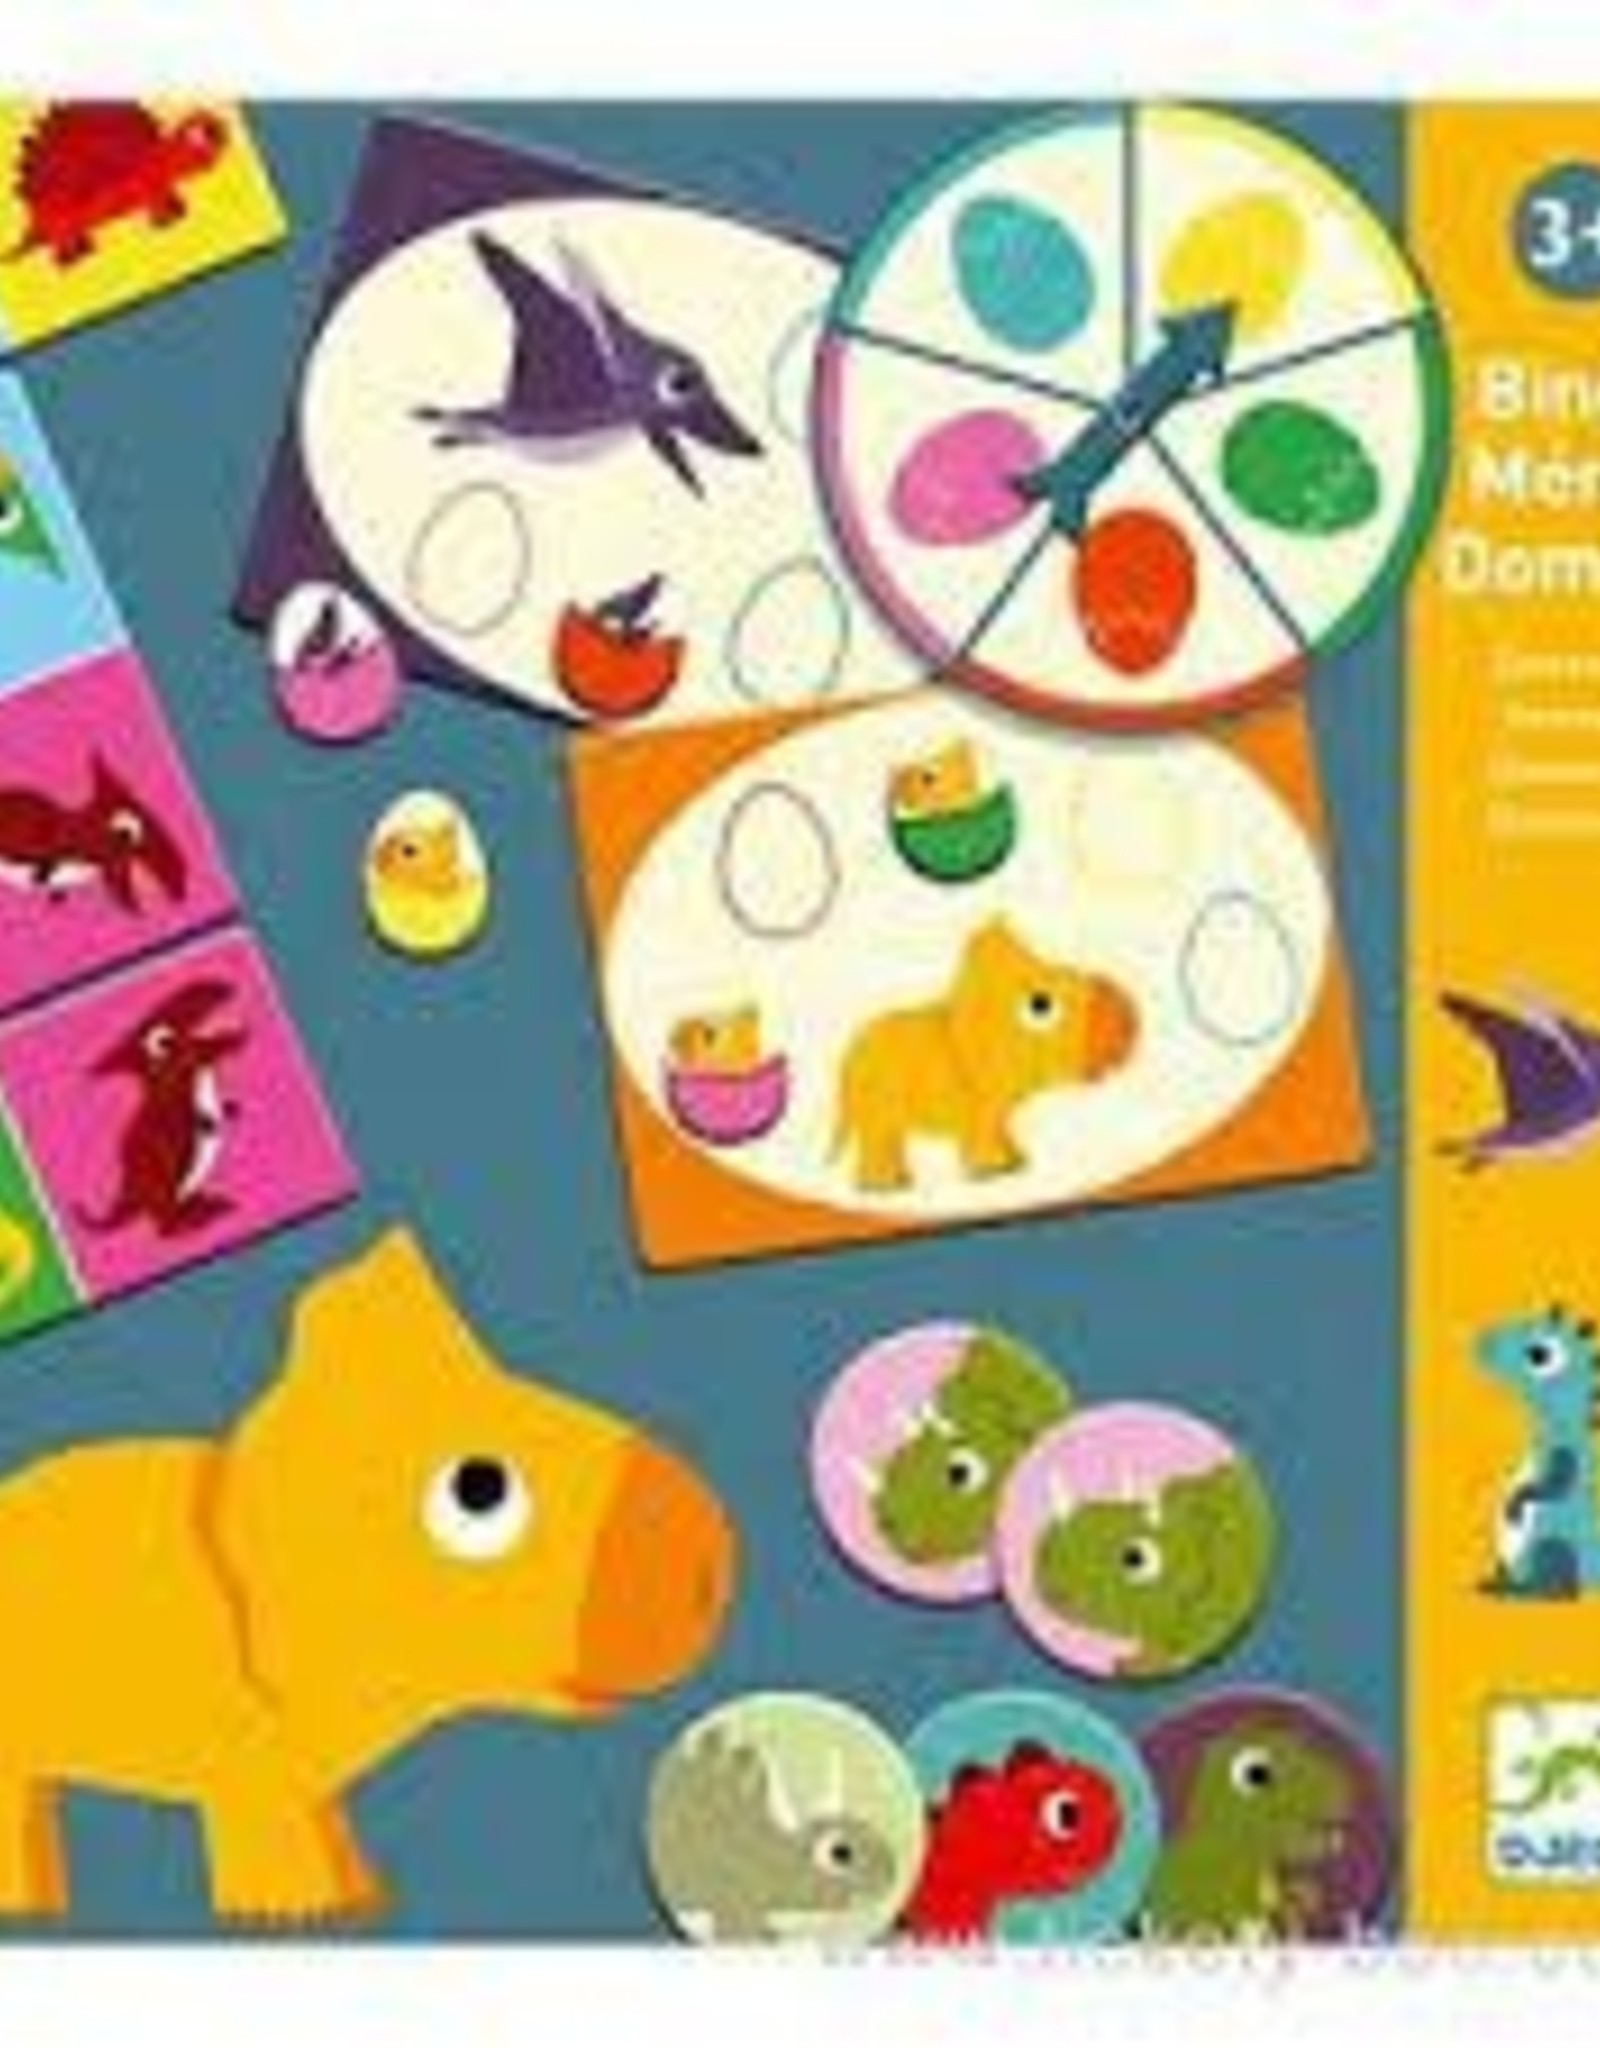 DJECO My First Games Bingo Memo Domino - Dinosaurs